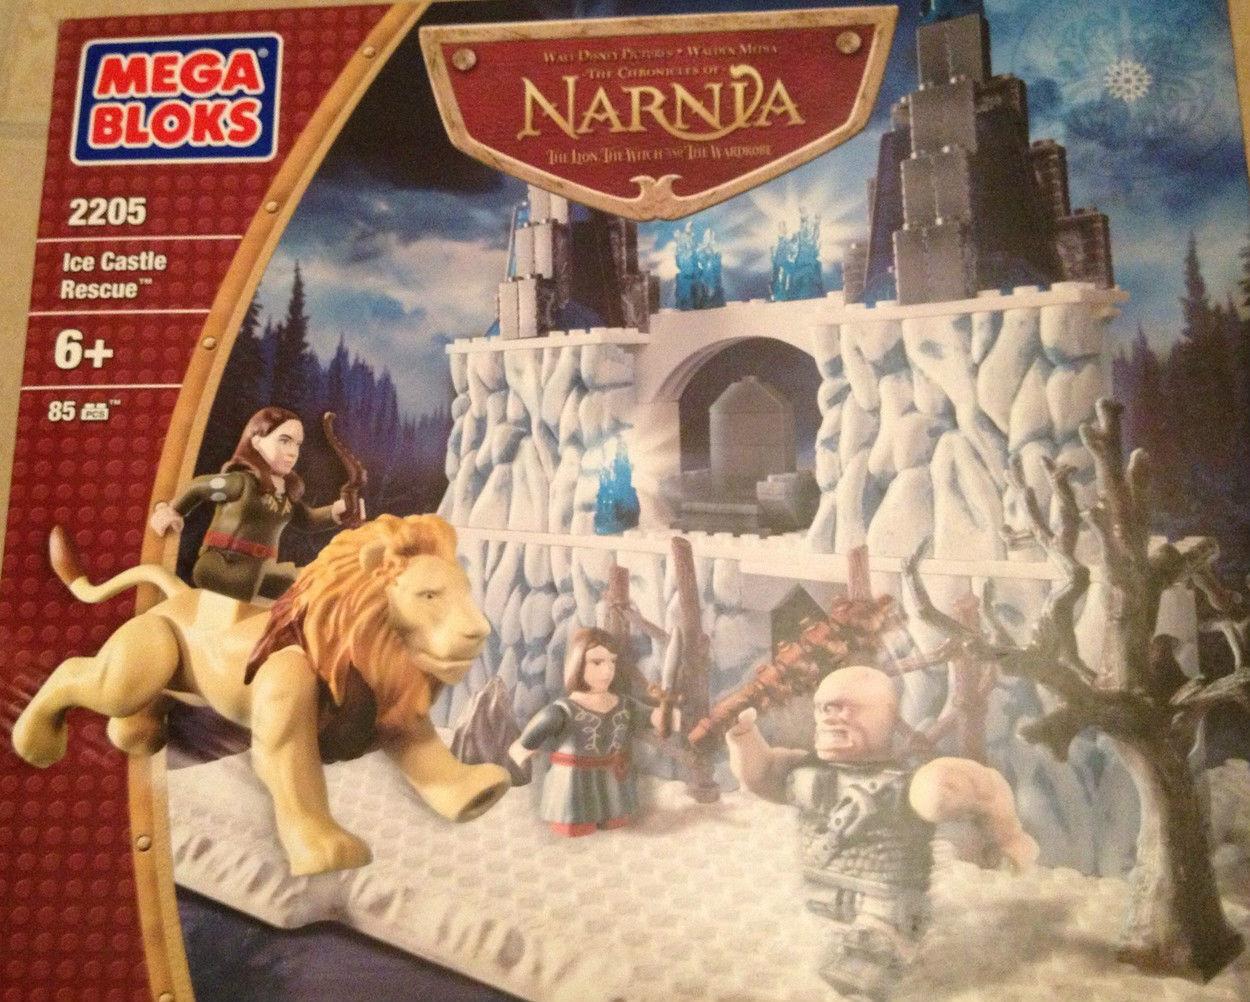 Mega Bloks Chronicles of Narnia Ice Castle Rescue (2205) New Sealed